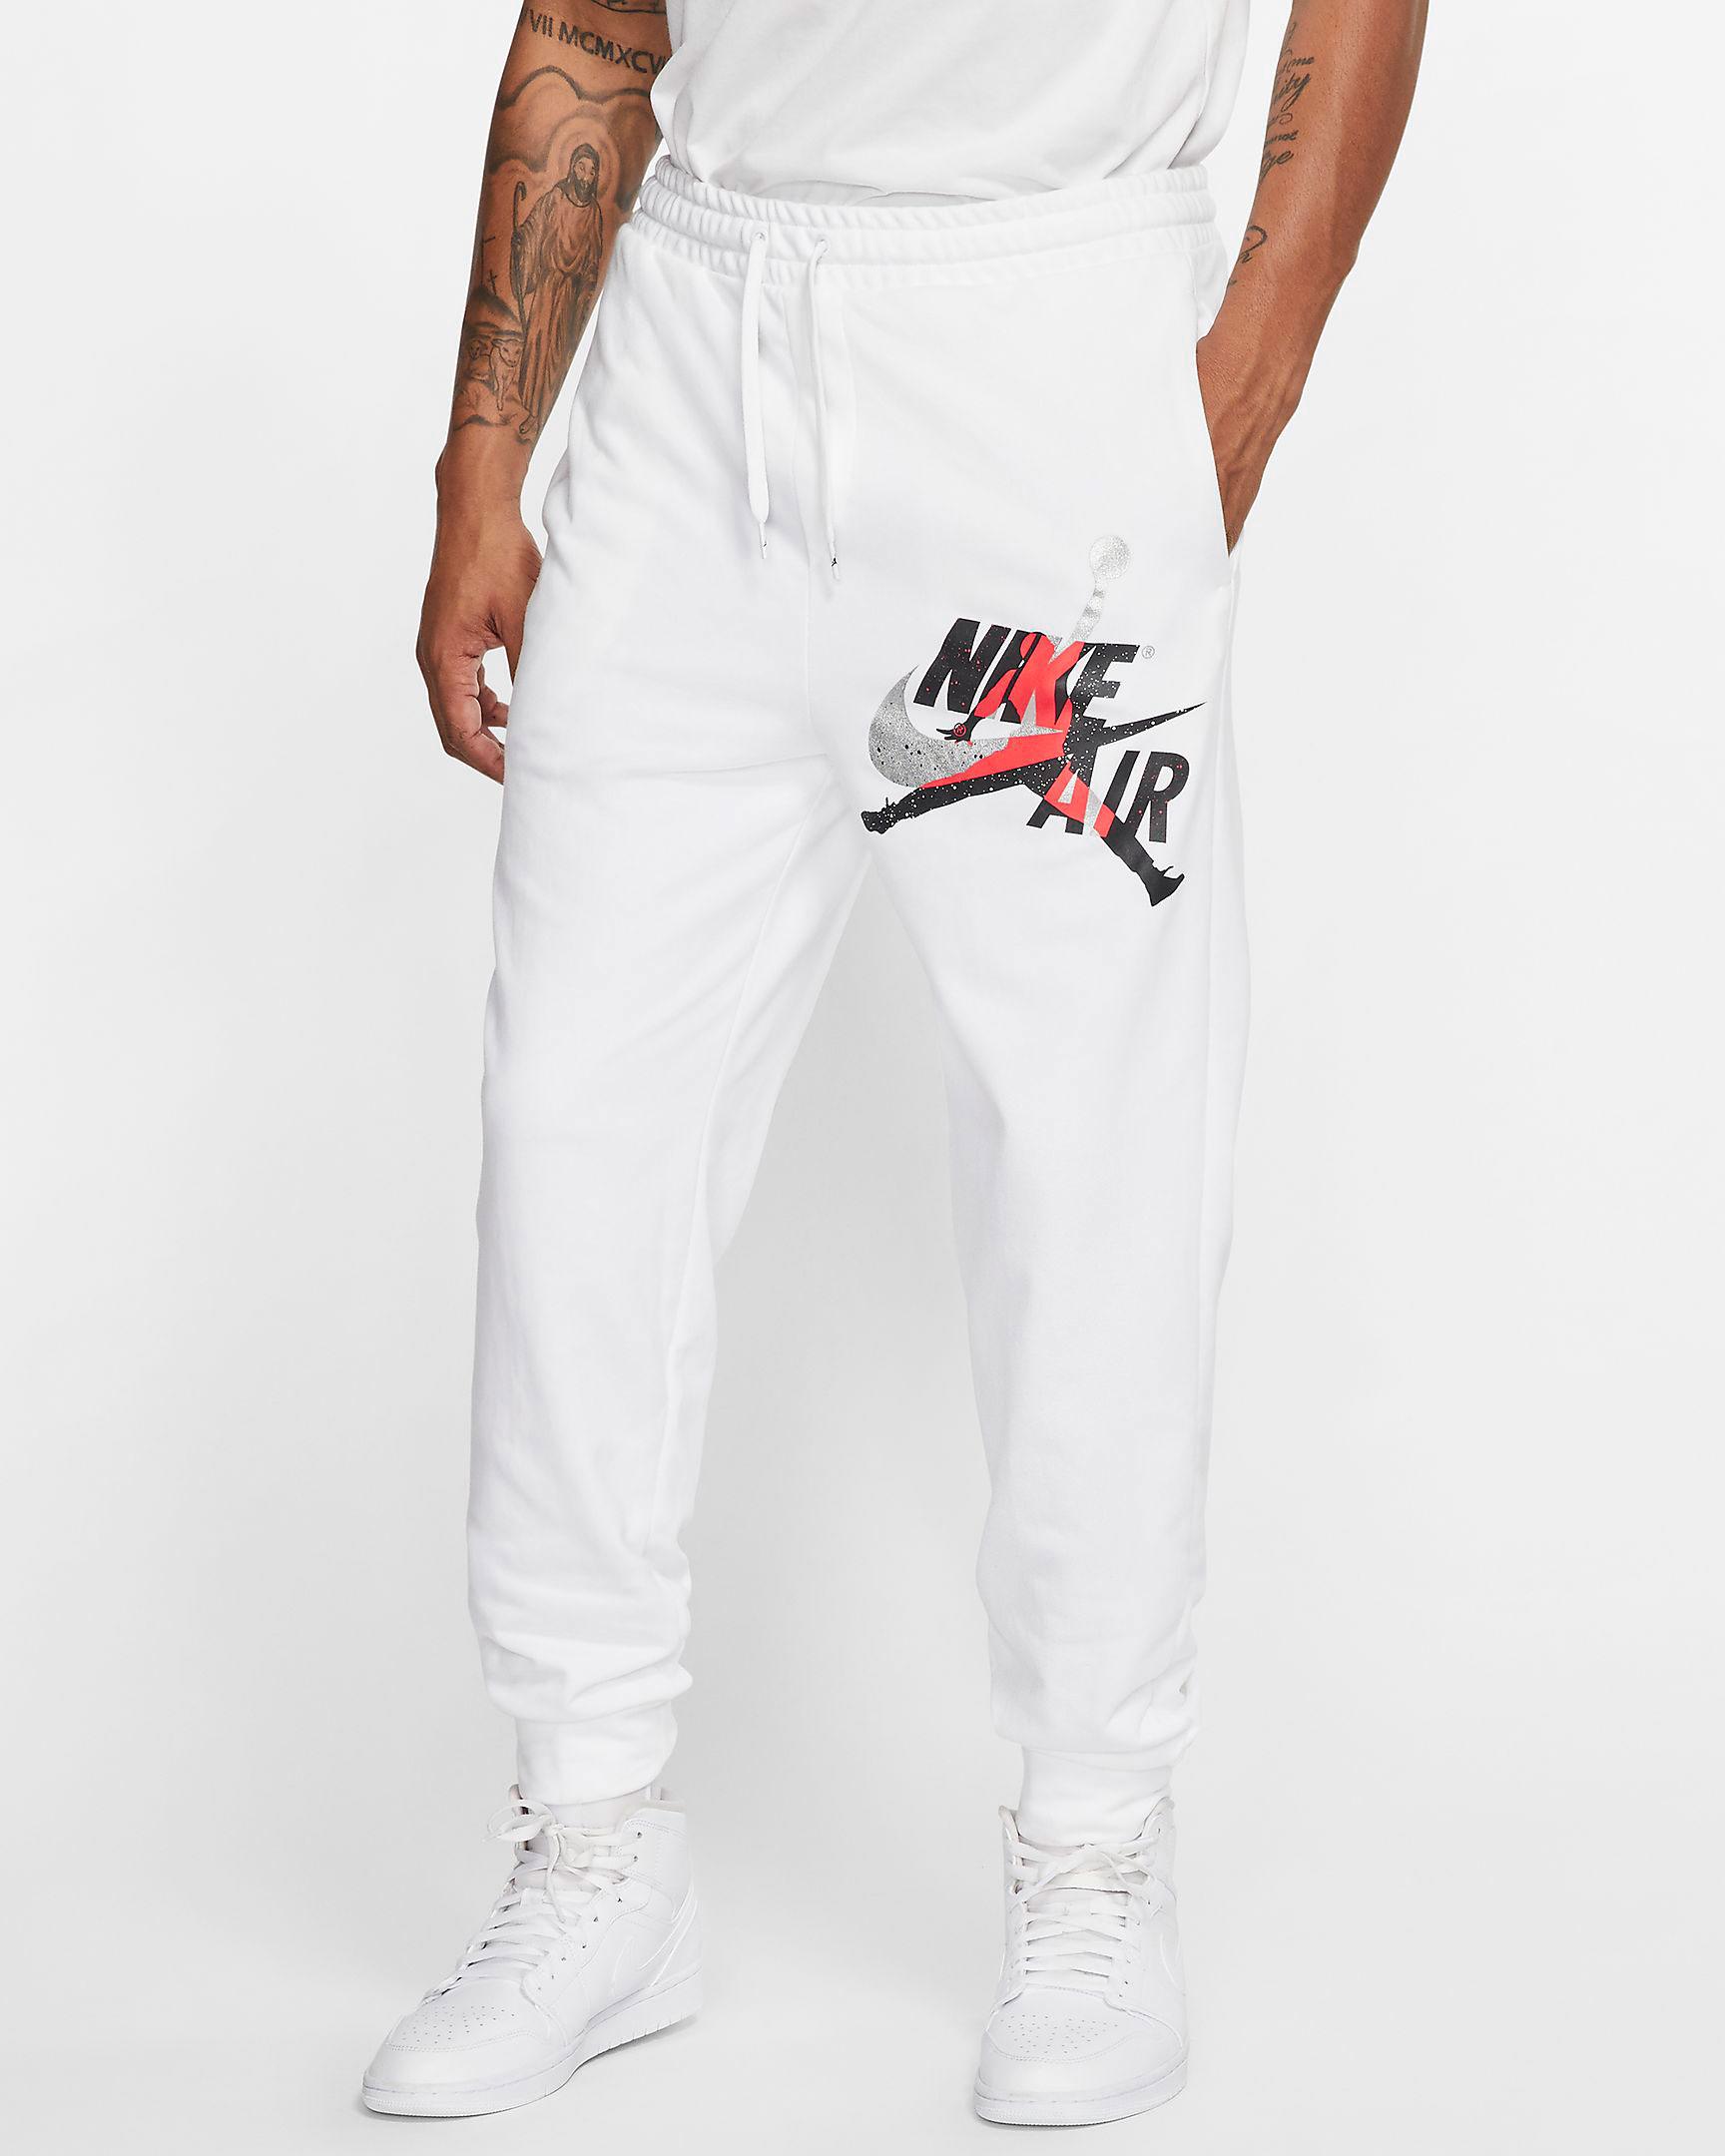 jordan-jumpman-classics-pants-white-infrared-black